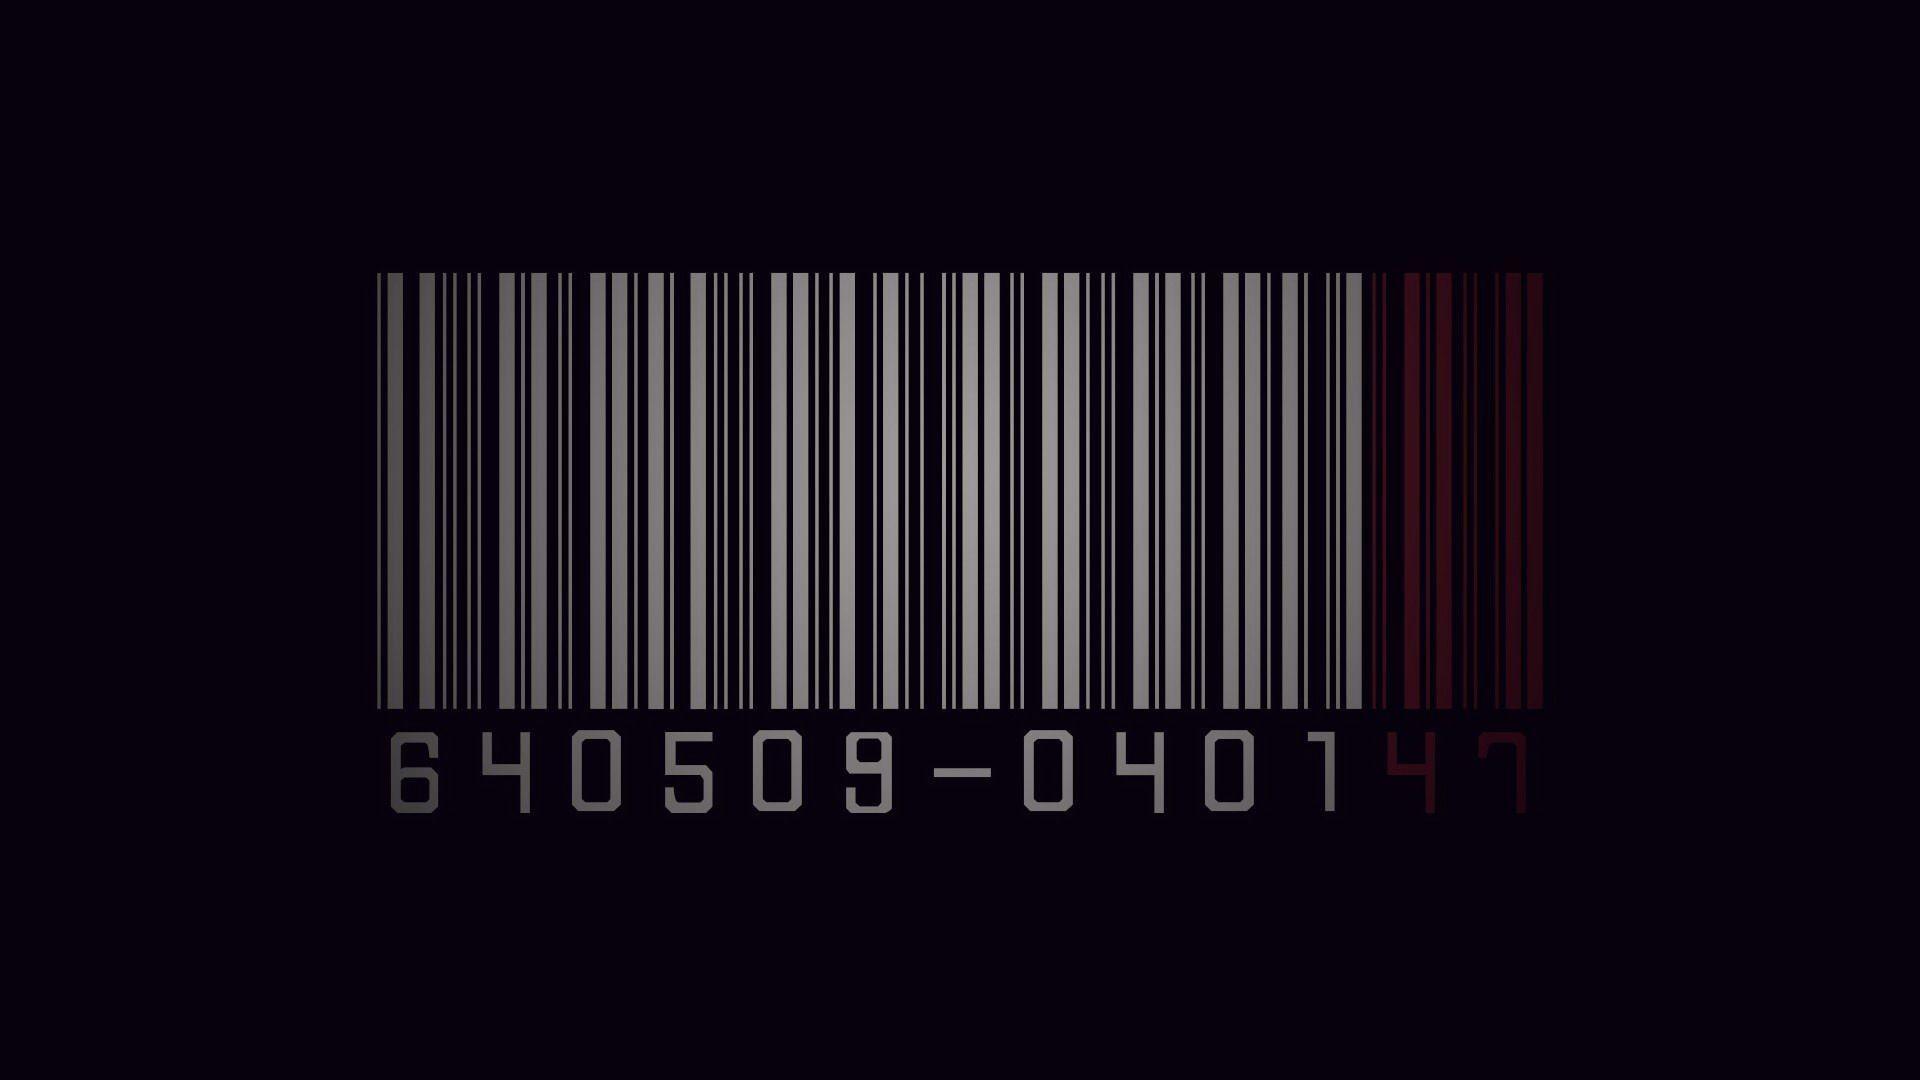 Preview wallpaper hitman absolution, game, hitman, 47, bar code 1920×1080